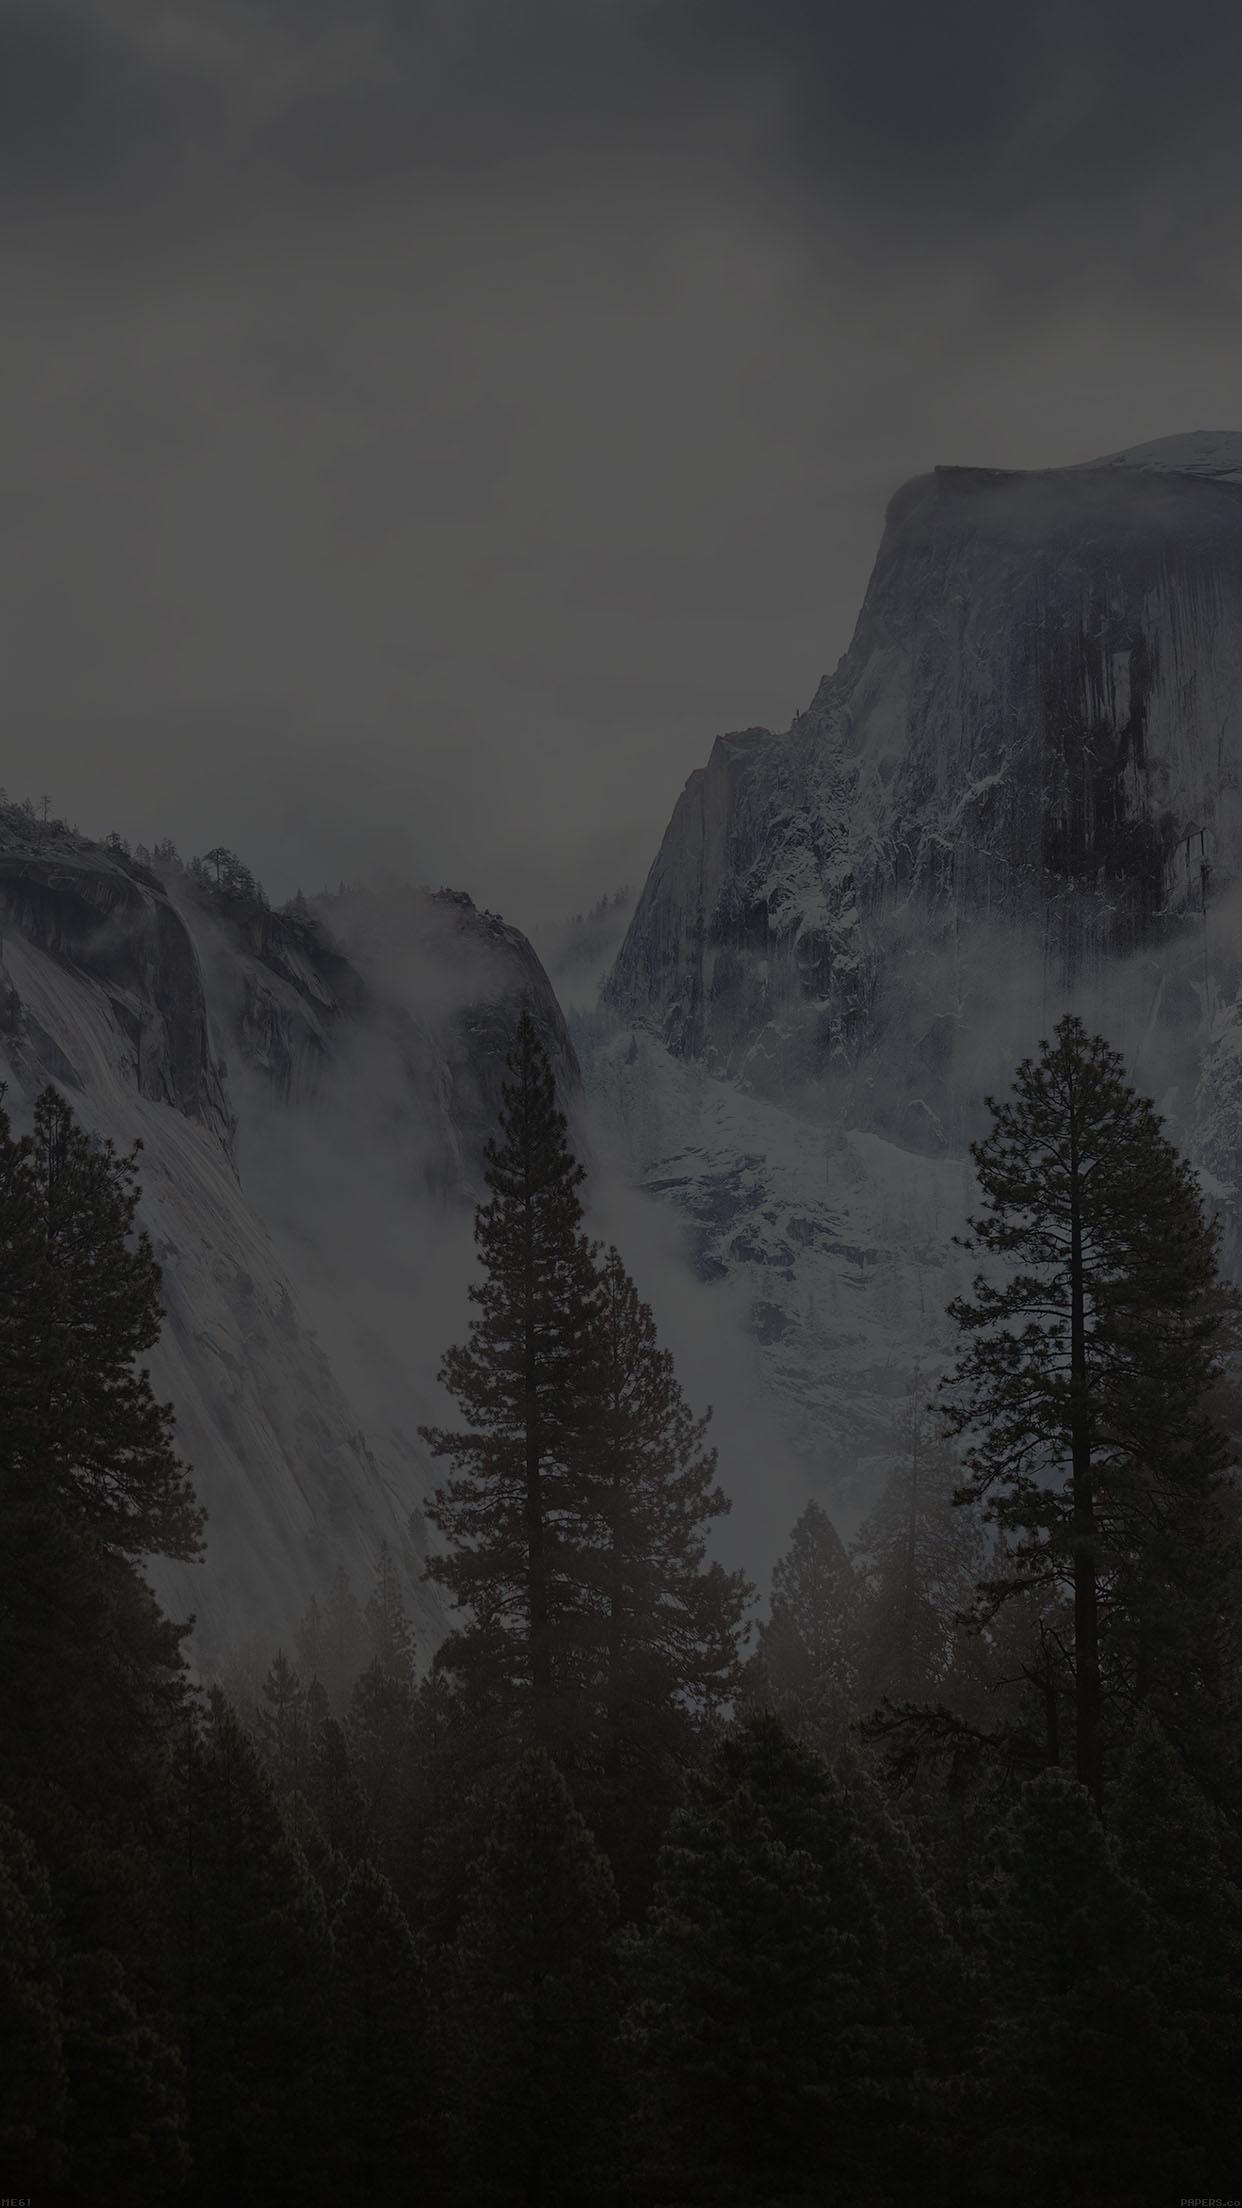 Iphone 6 Plus - Black Mountains Wallpaper Iphone 8 Plus , HD Wallpaper & Backgrounds